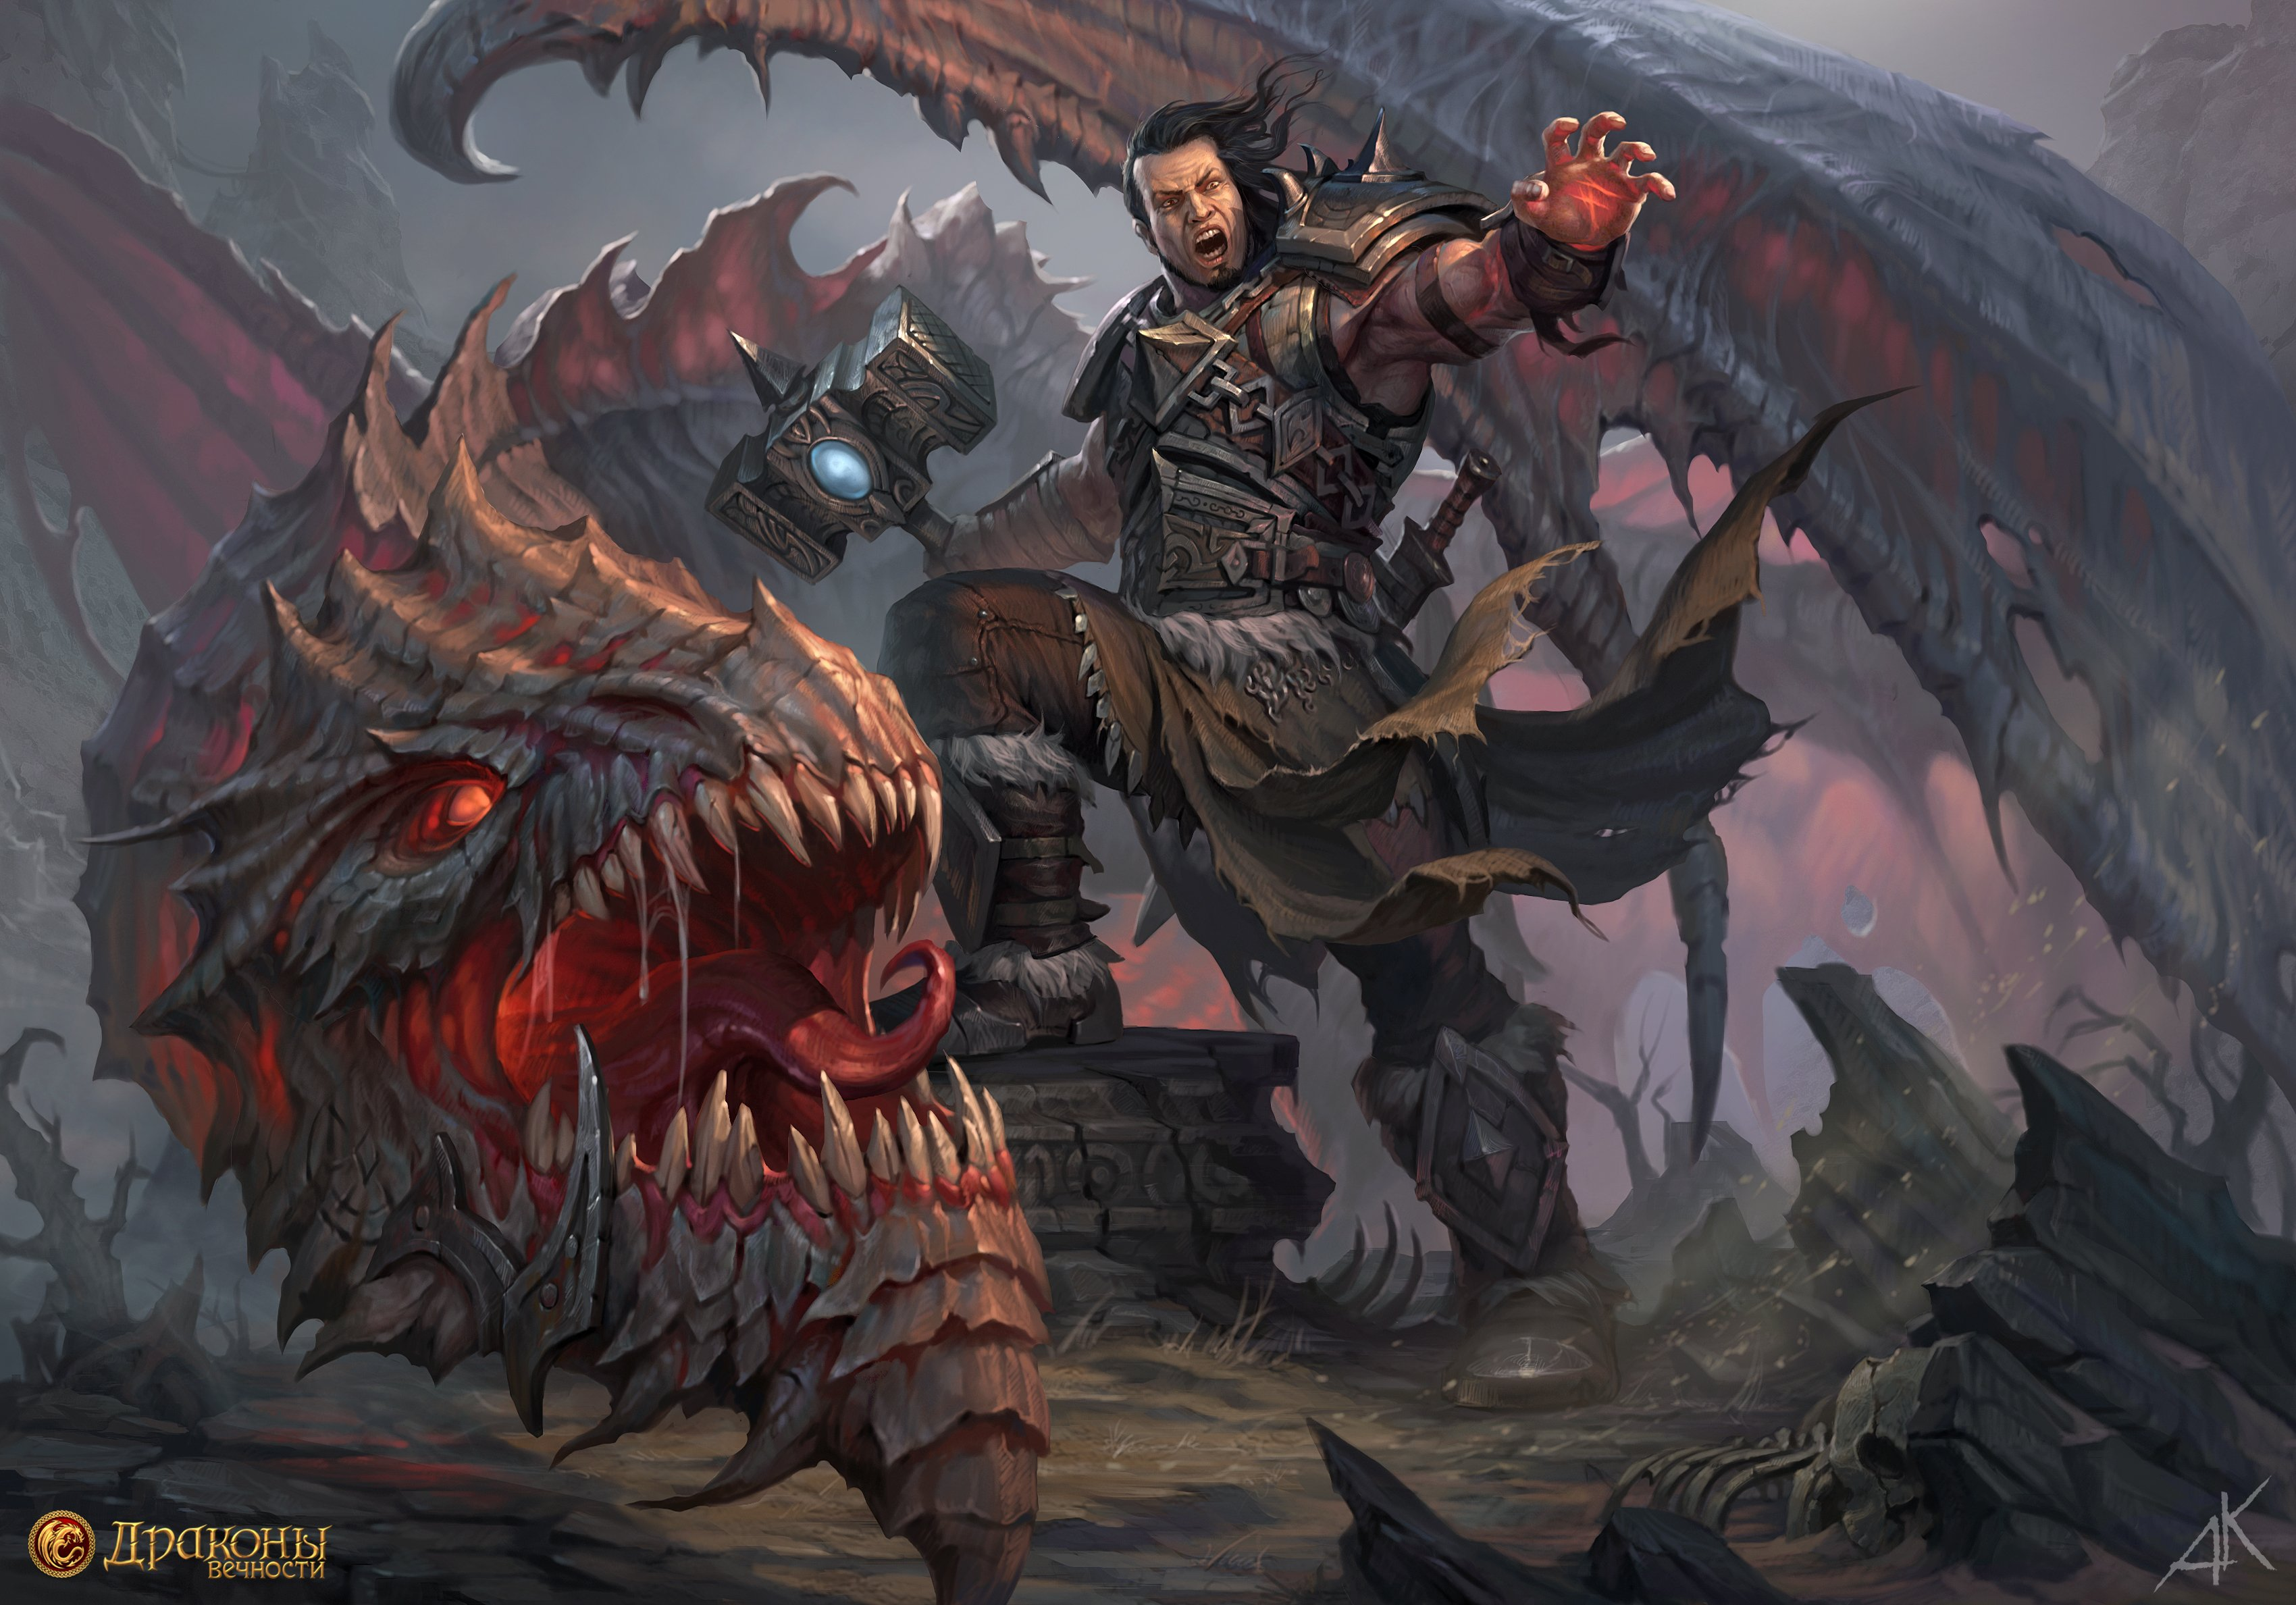 Armored Dragon Wallpaper Dragon Warrior Dragon Eternity